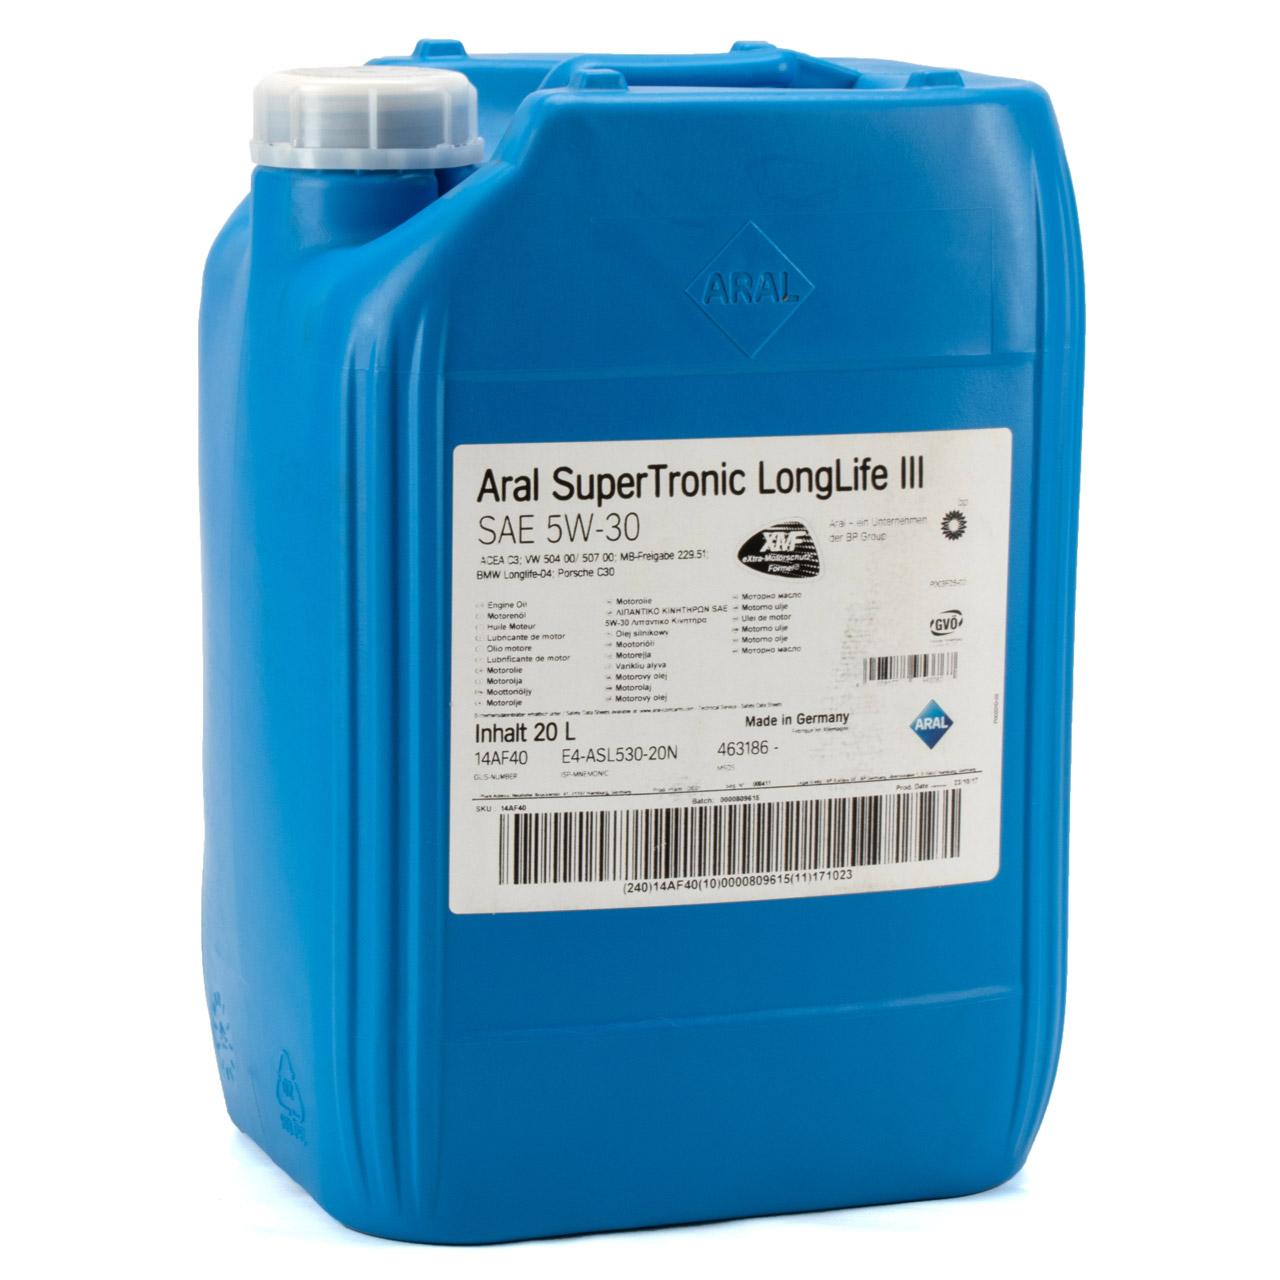 ARAL Motoröl Öl SUPER TRONIC LongLife III 5W30 für VW 504.00/507.00 - 20 Liter